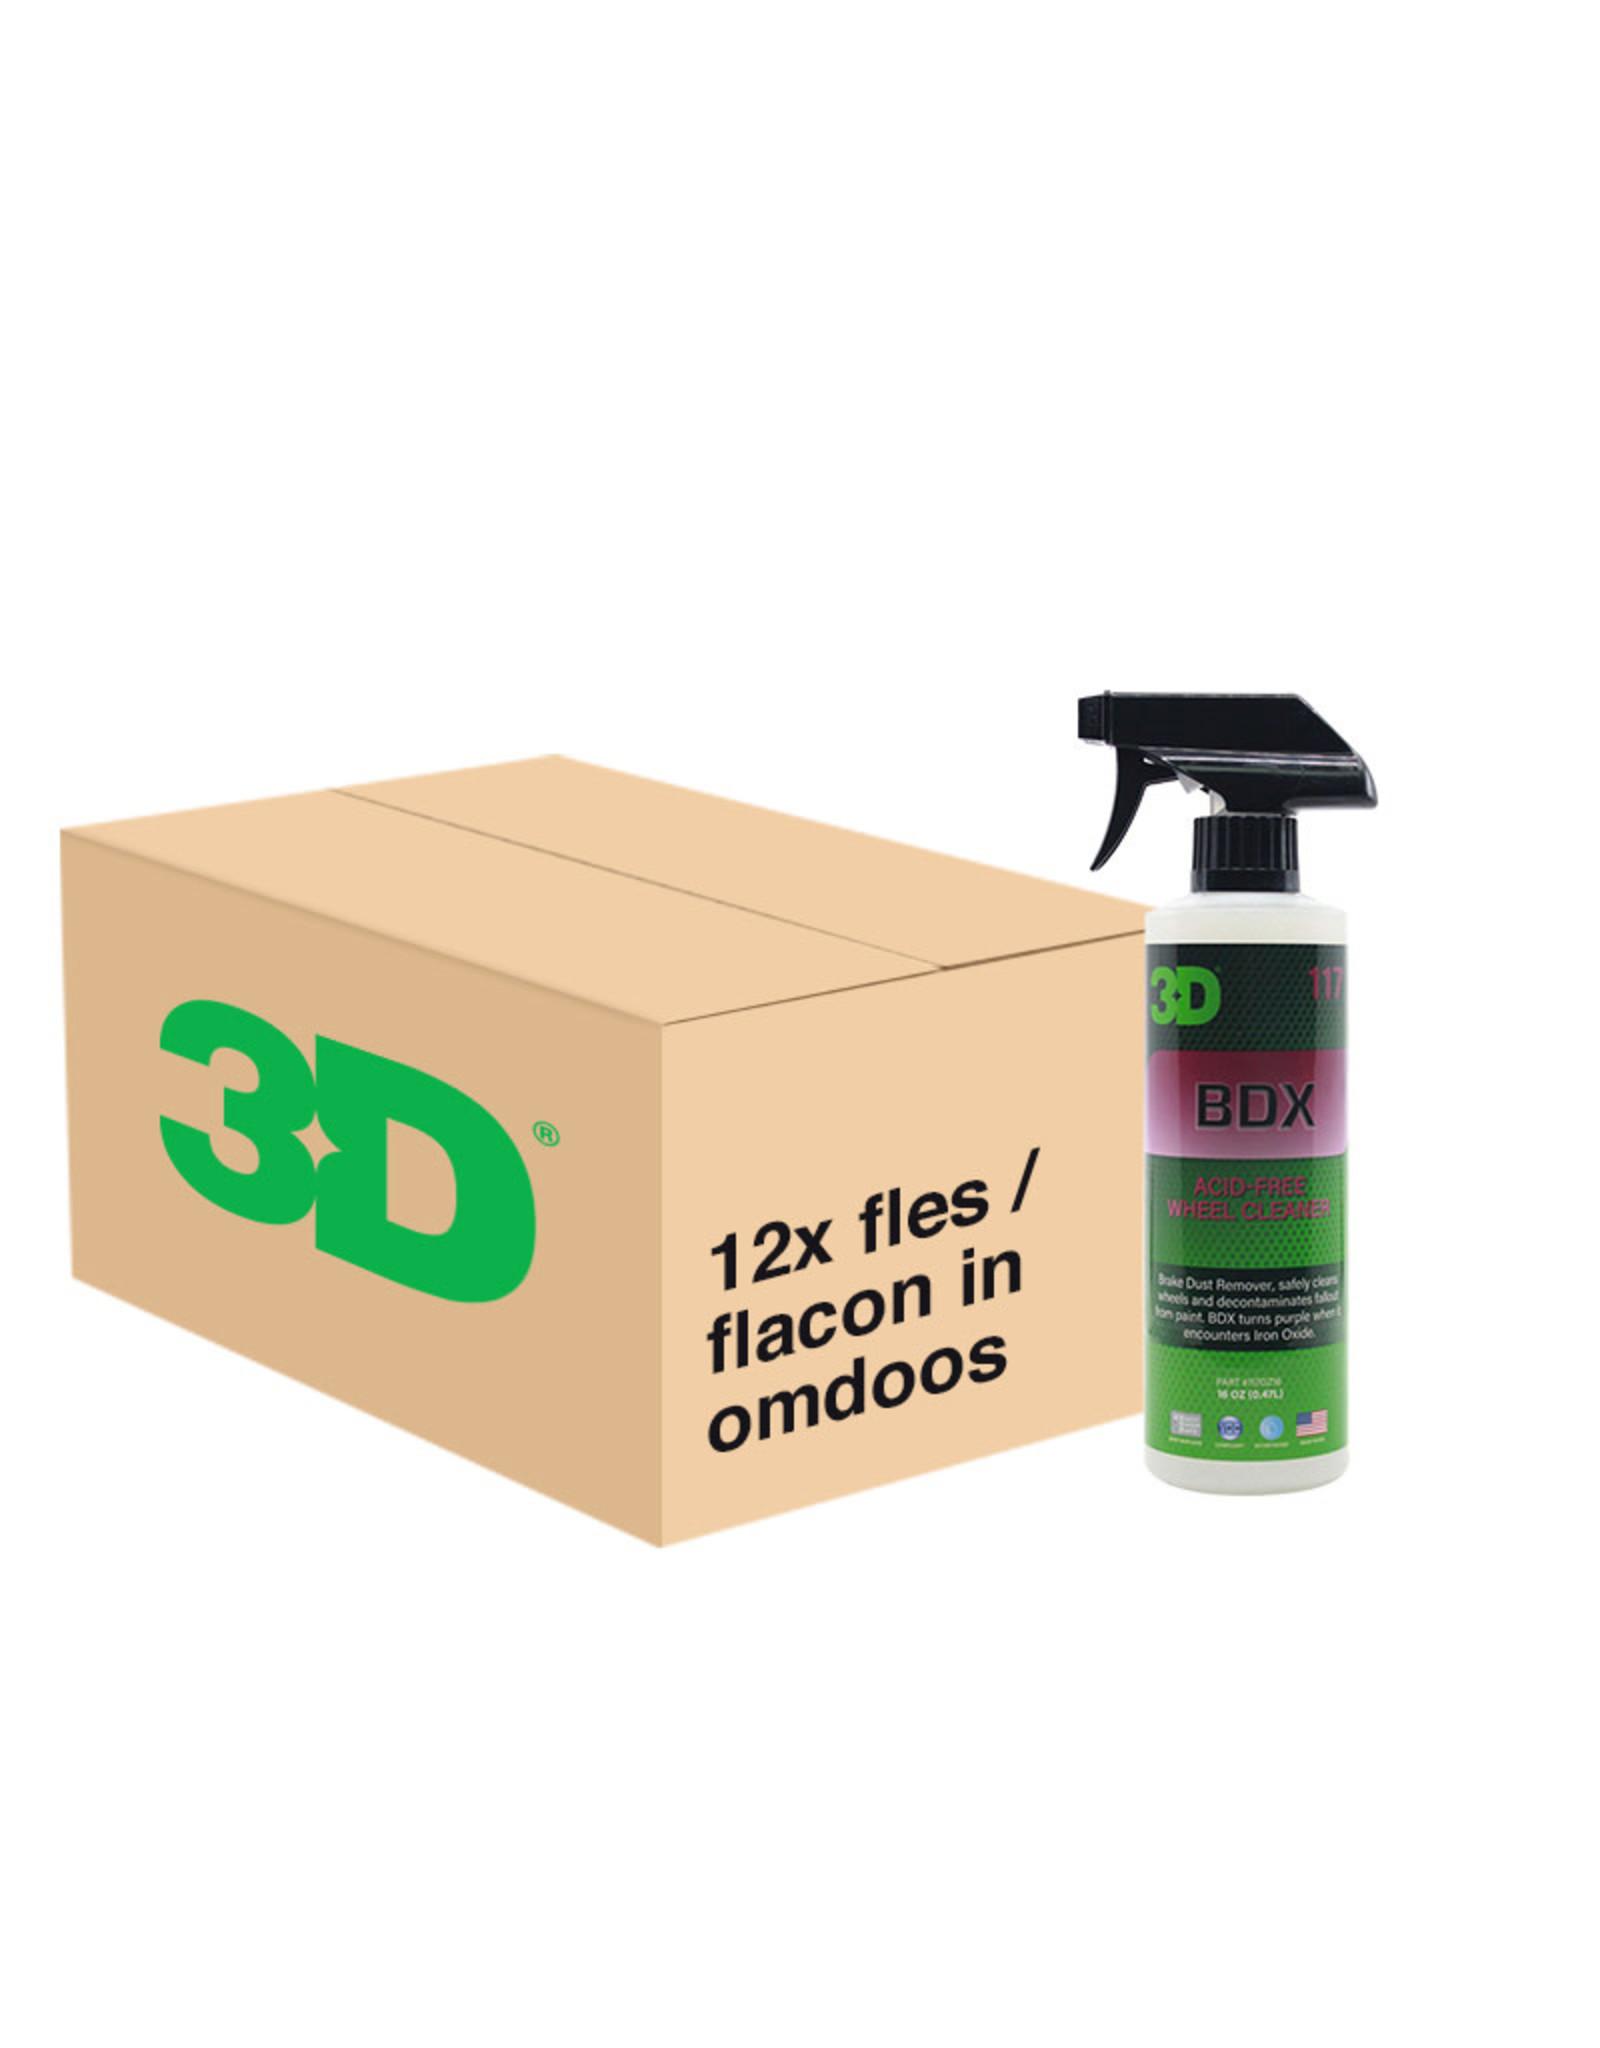 3D PRODUCTS 3D BDX - 16 oz / 473 ml - grootverpakking